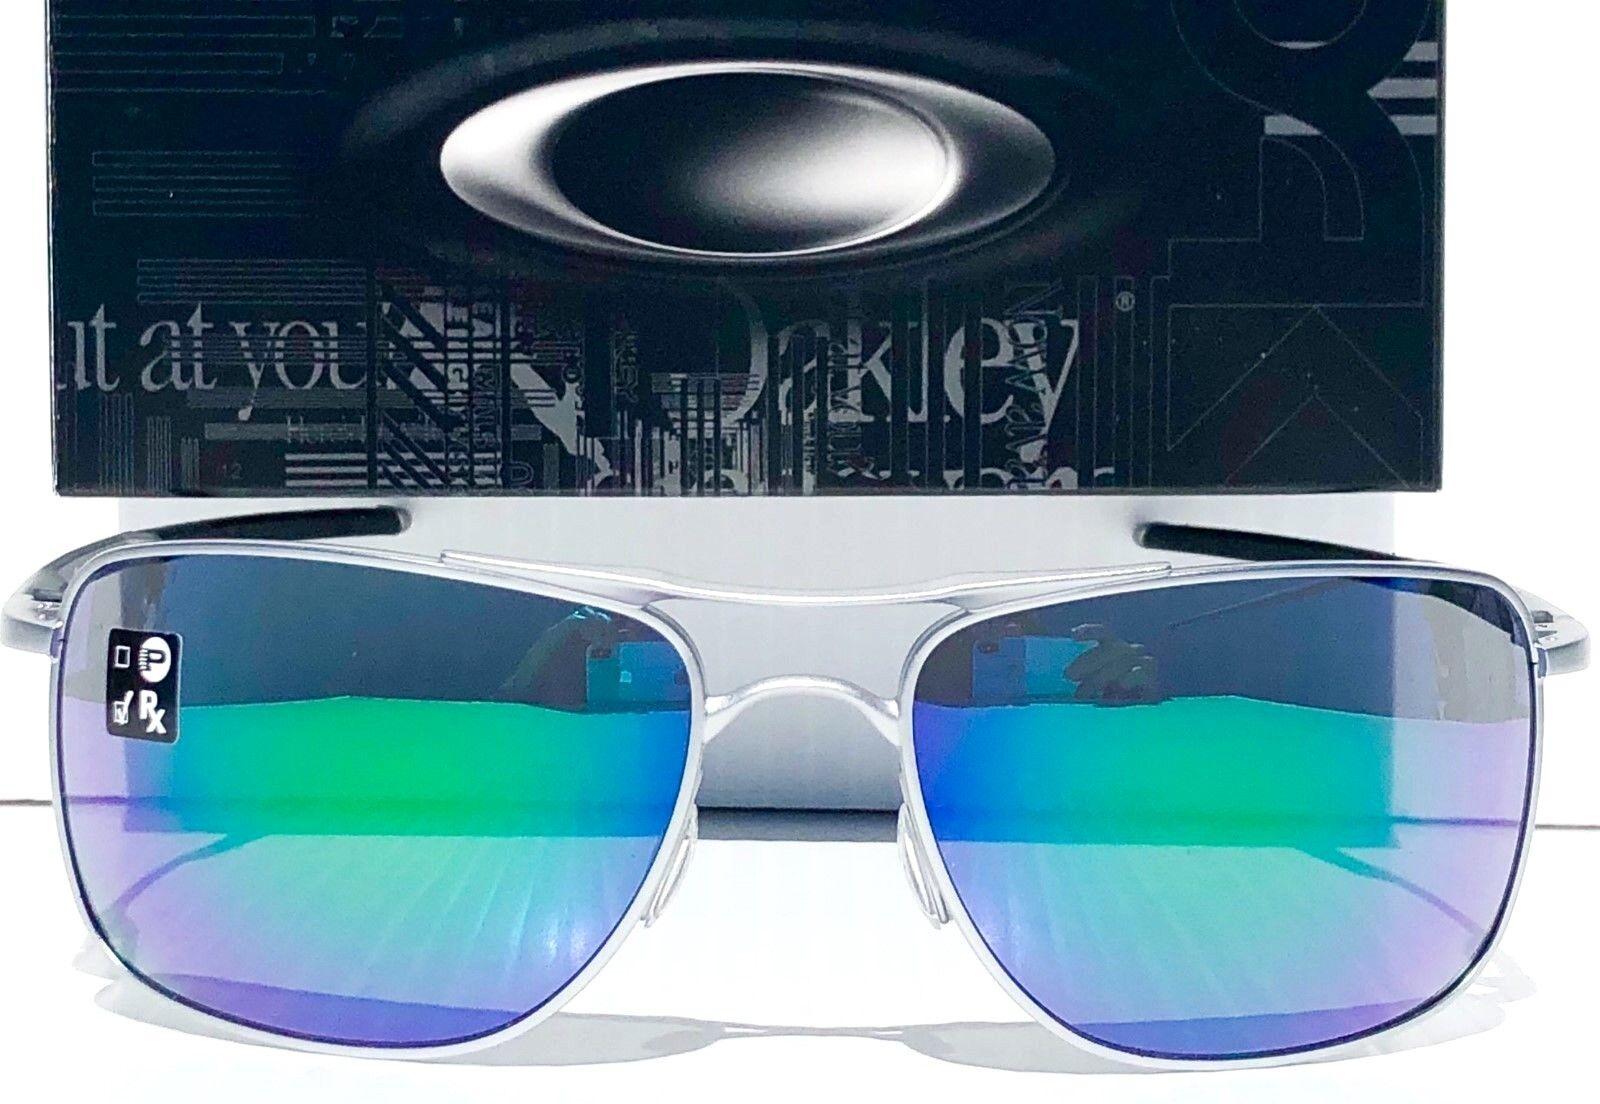 31b258b29cf Oakley 0oo4124 Gauge 8 Rectangle Unisex Sunglasses Jade Iridium Matte Lead  62 for sale online